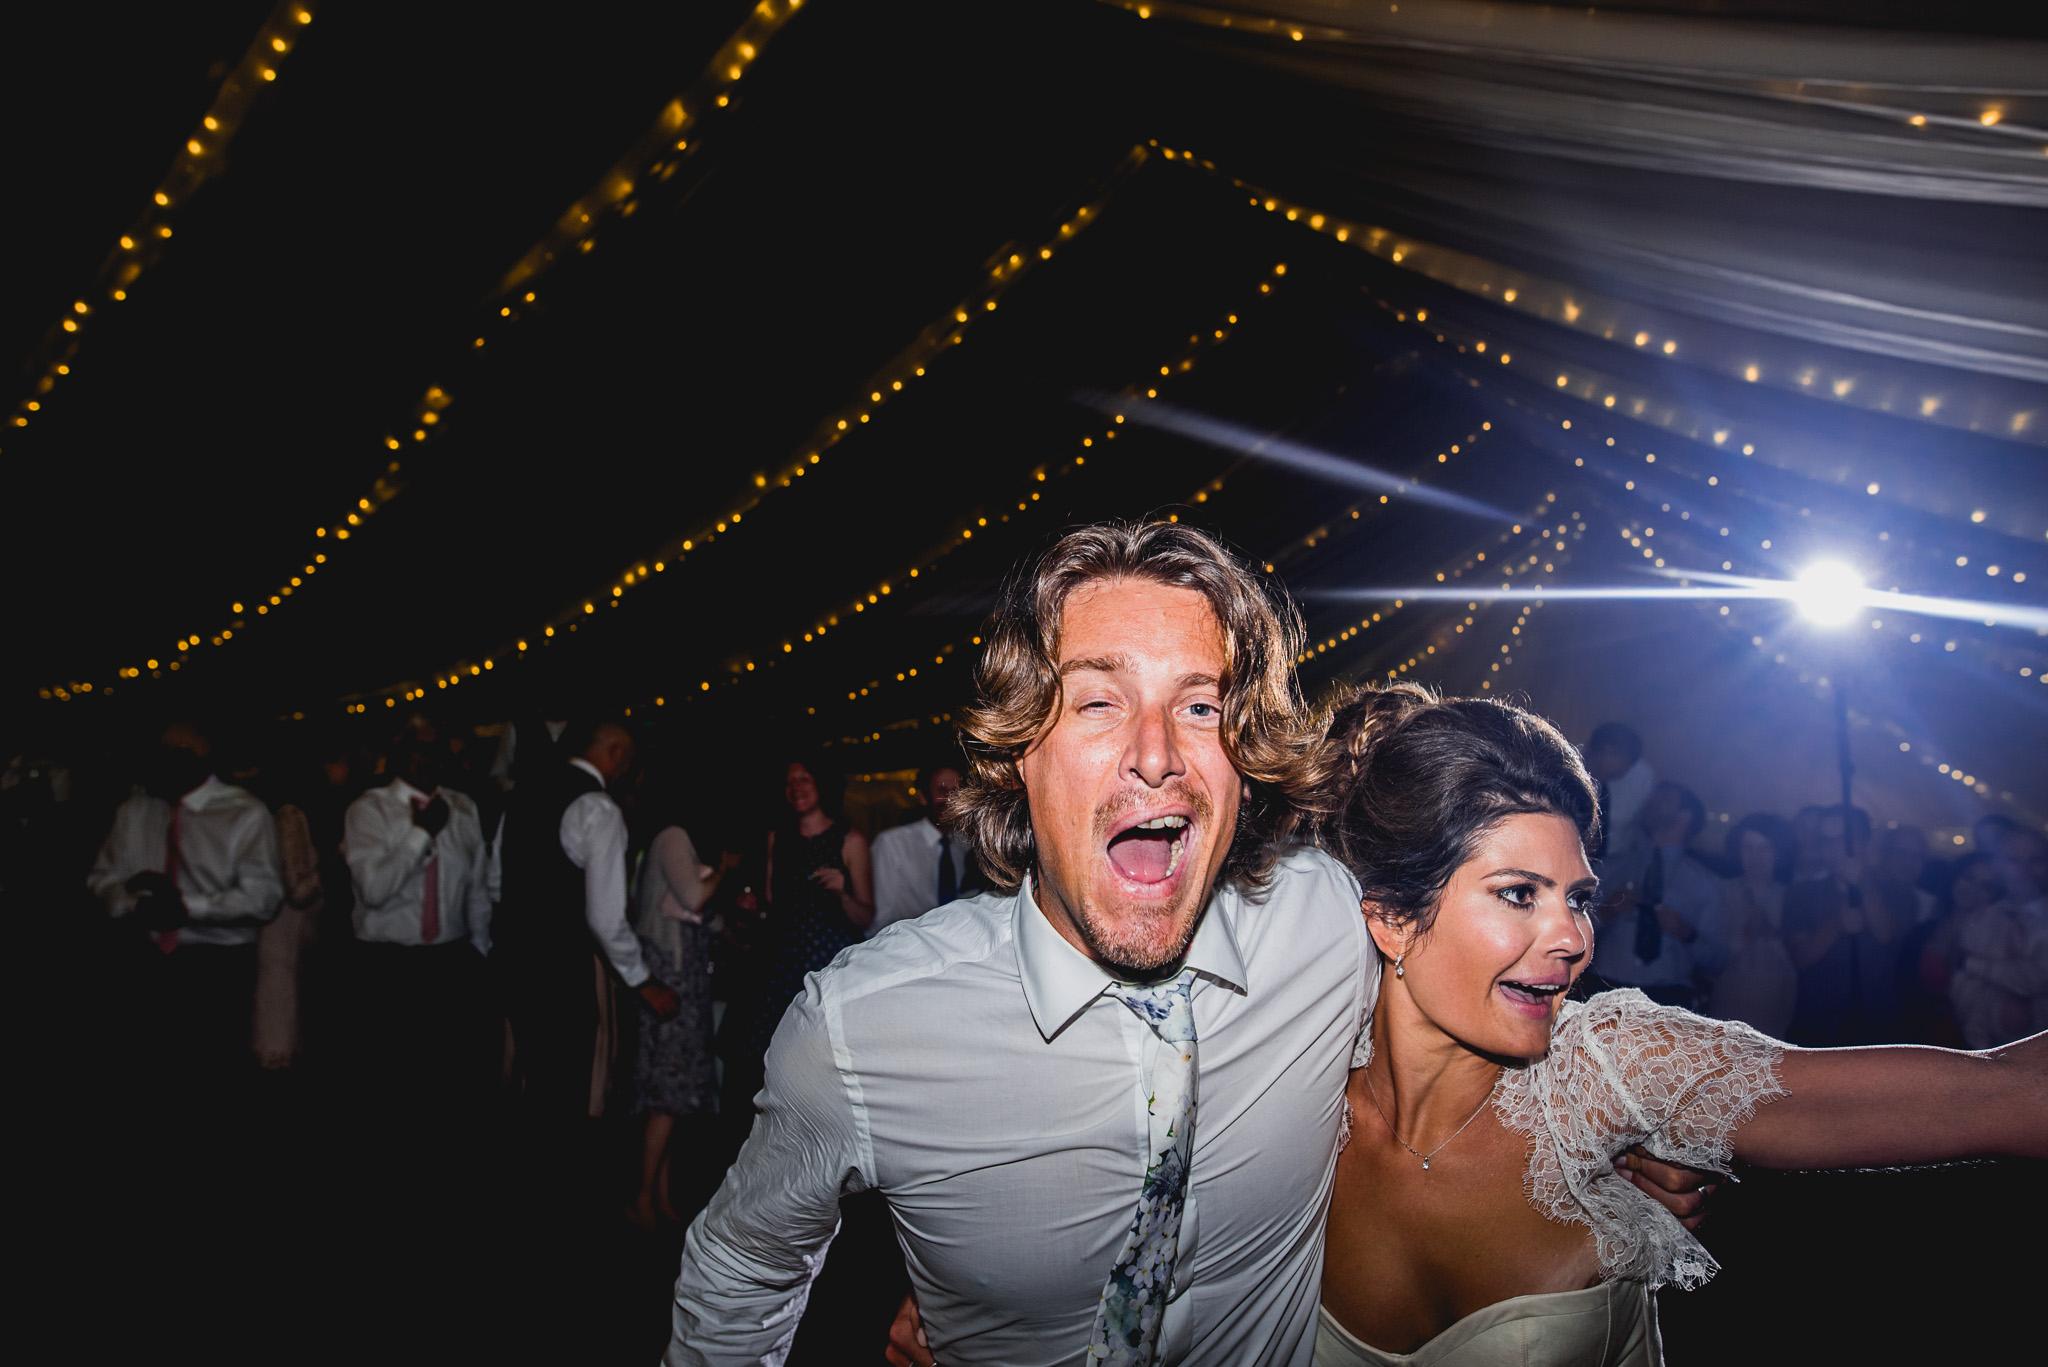 Lara & Jack Wedding 220815 by Barney Walters_1068_BW2_1143